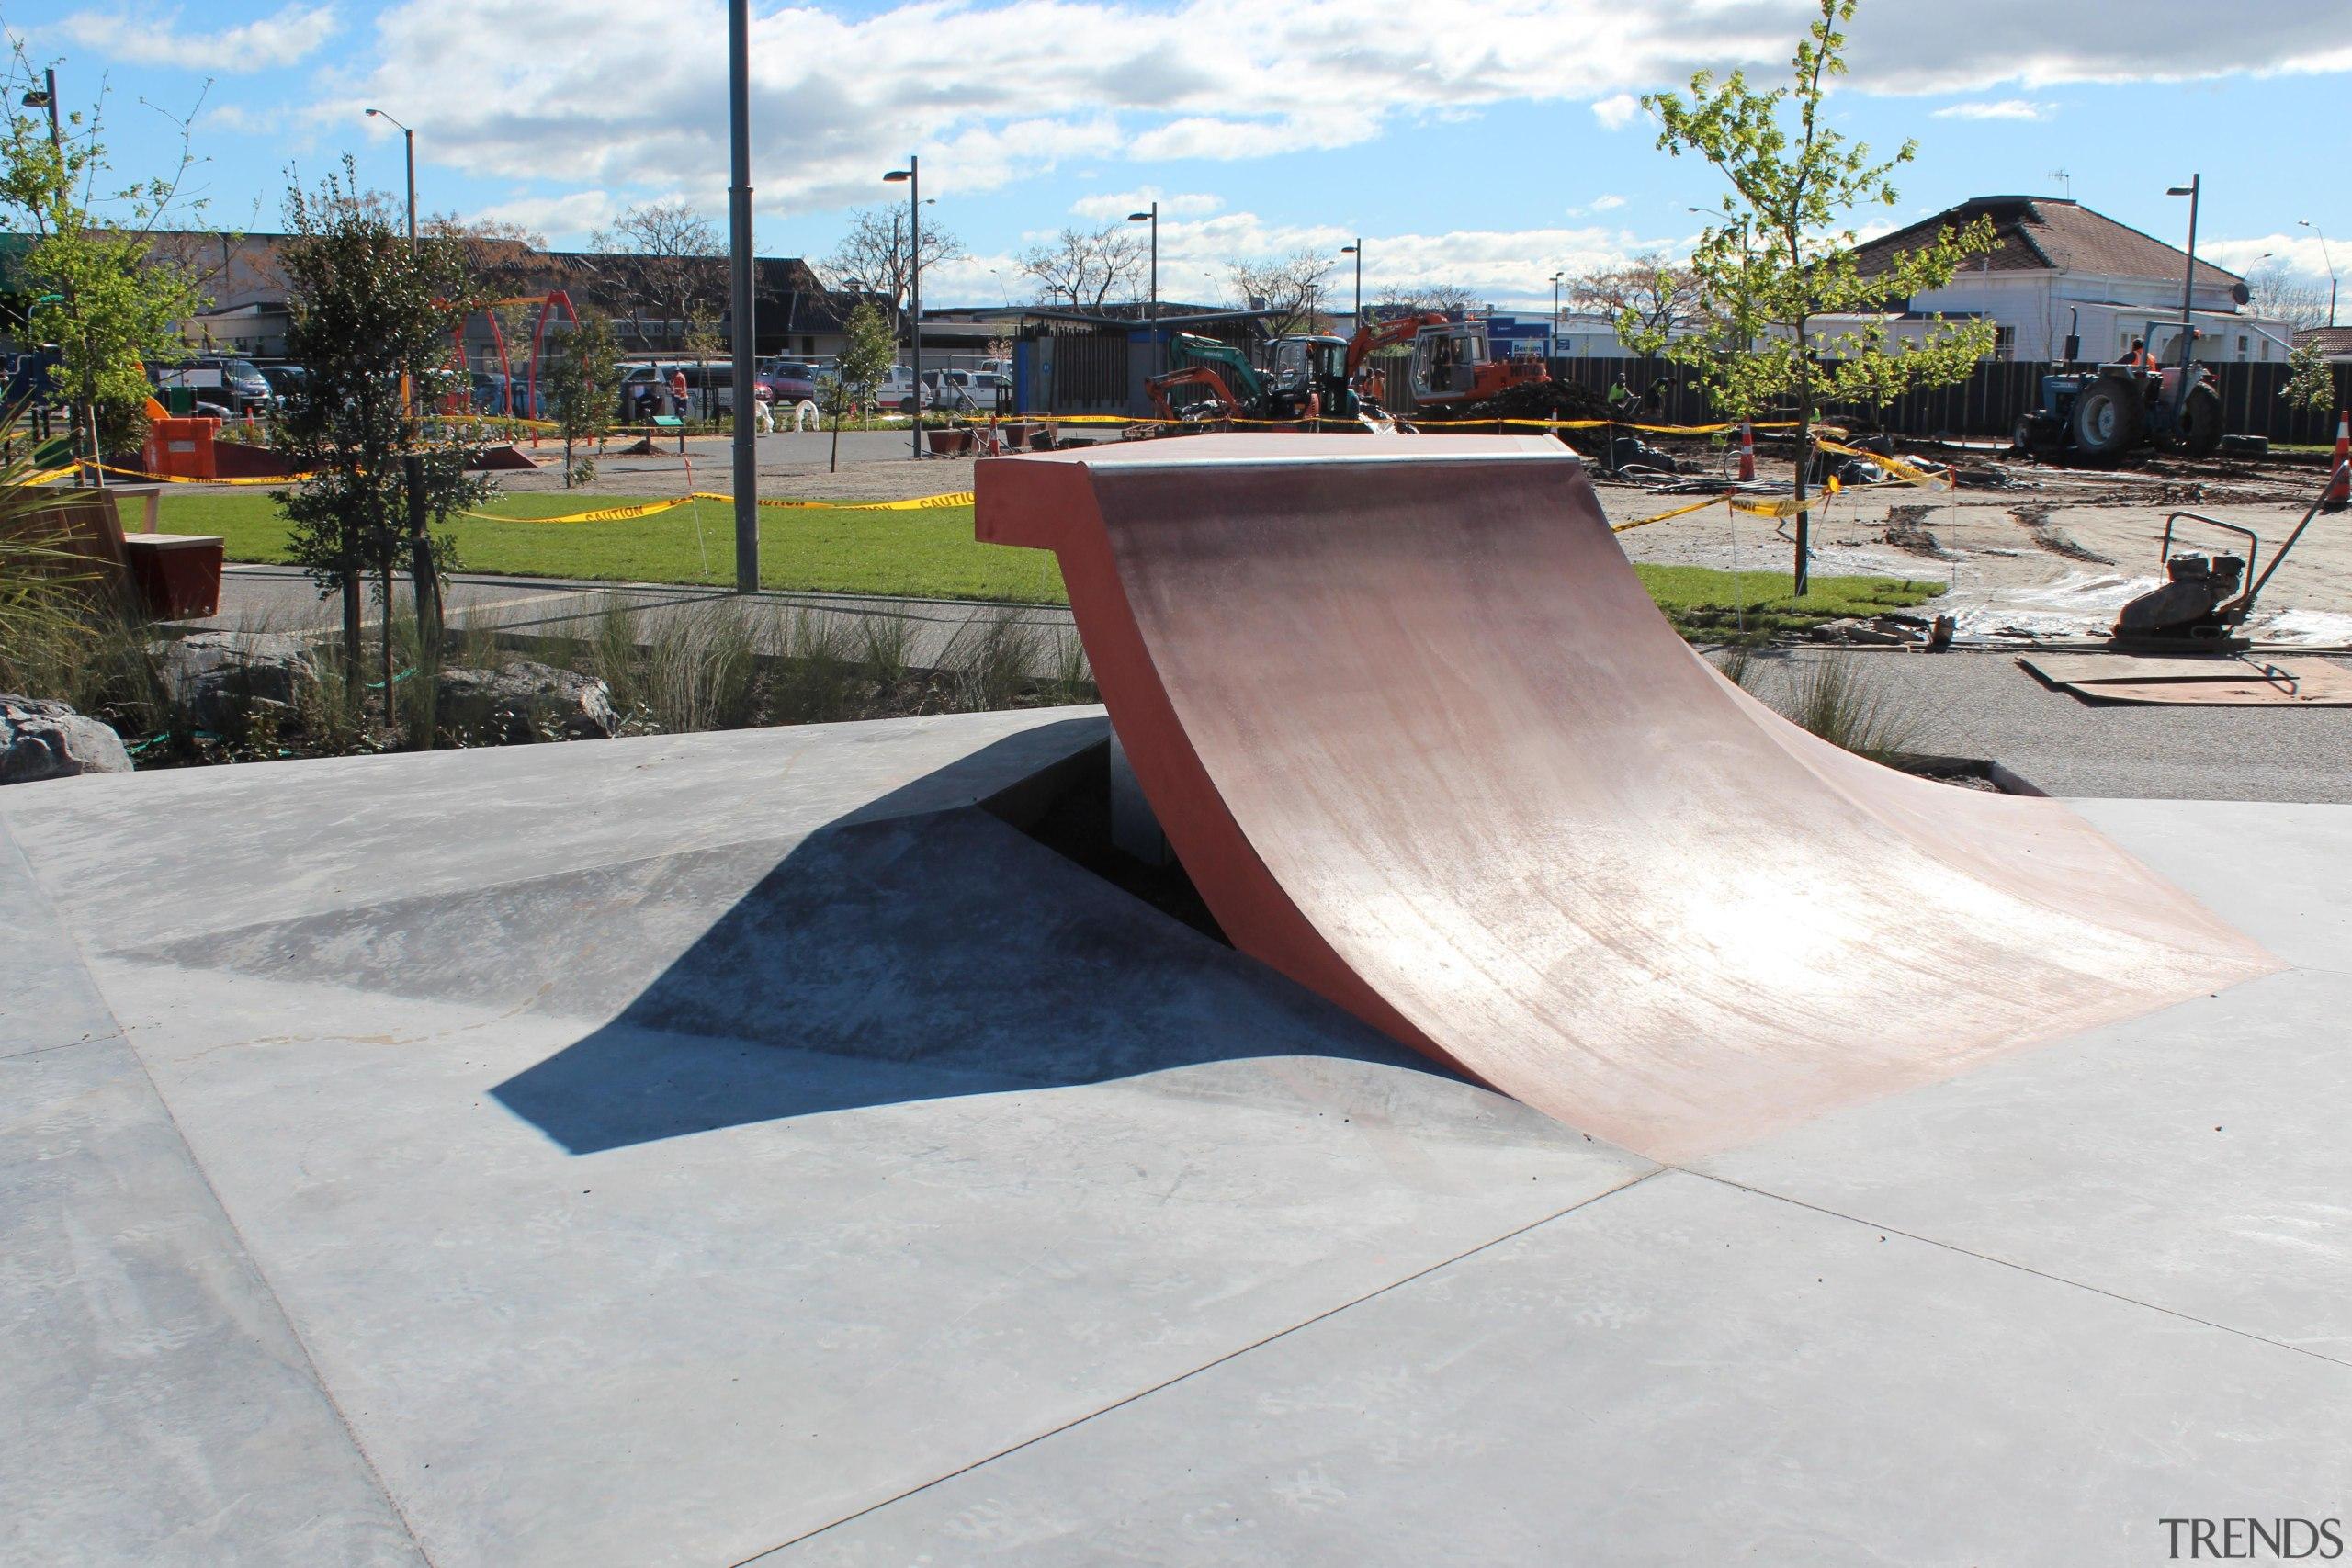 colourmix 13.jpg - colourmix_13.jpg - boardsport | grind boardsport, grind rail, recreation, skateboard, skateboarding, skateboarding equipment and supplies, white, gray